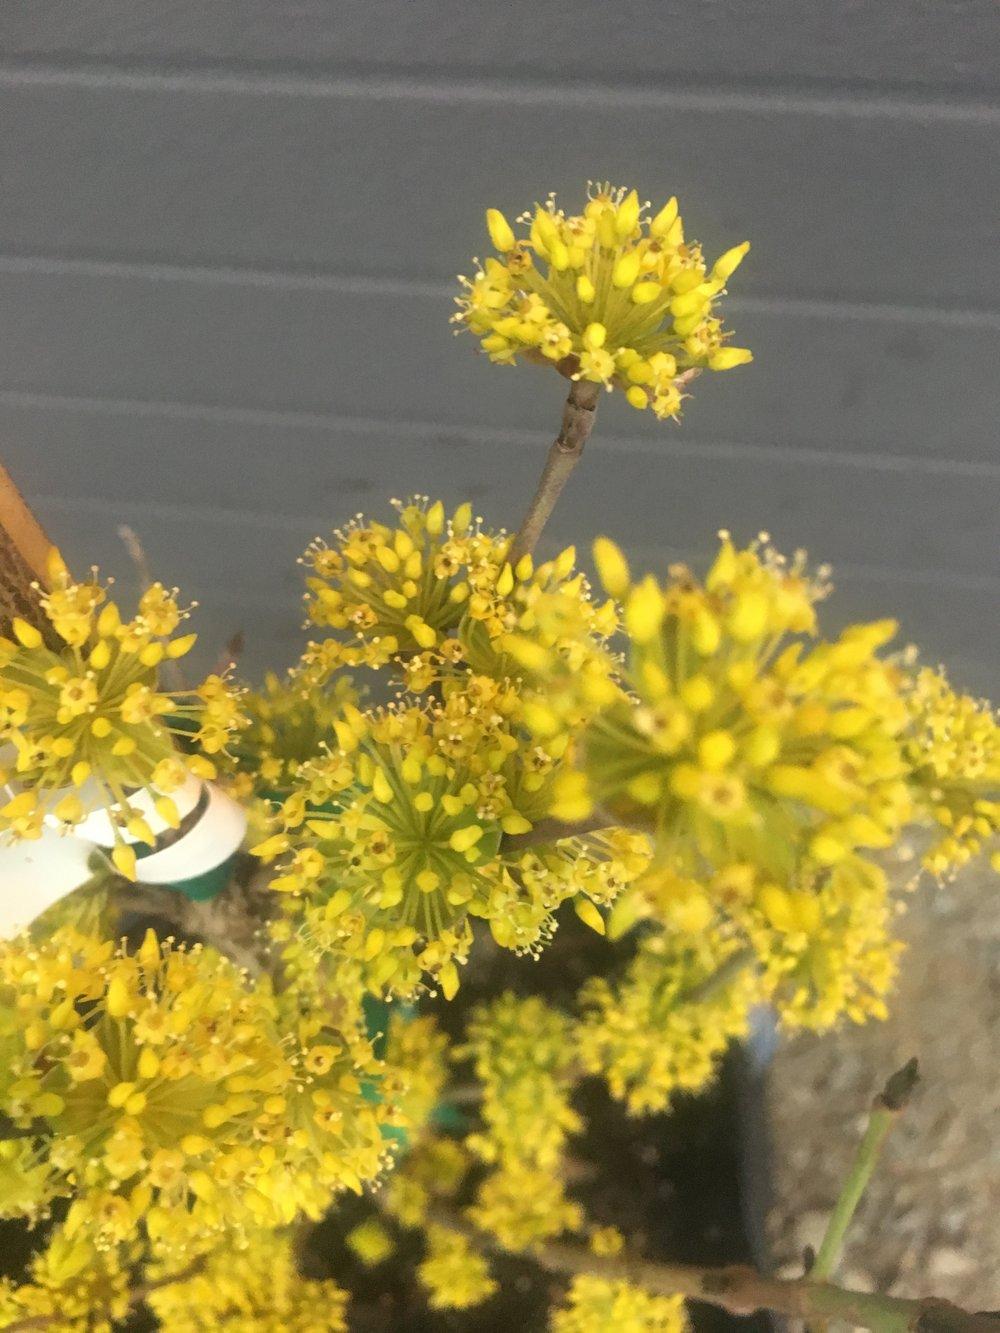 Cornus officinalis 'Kintoki' - Cornelian Cherry Dogwood 'Kintoki' -